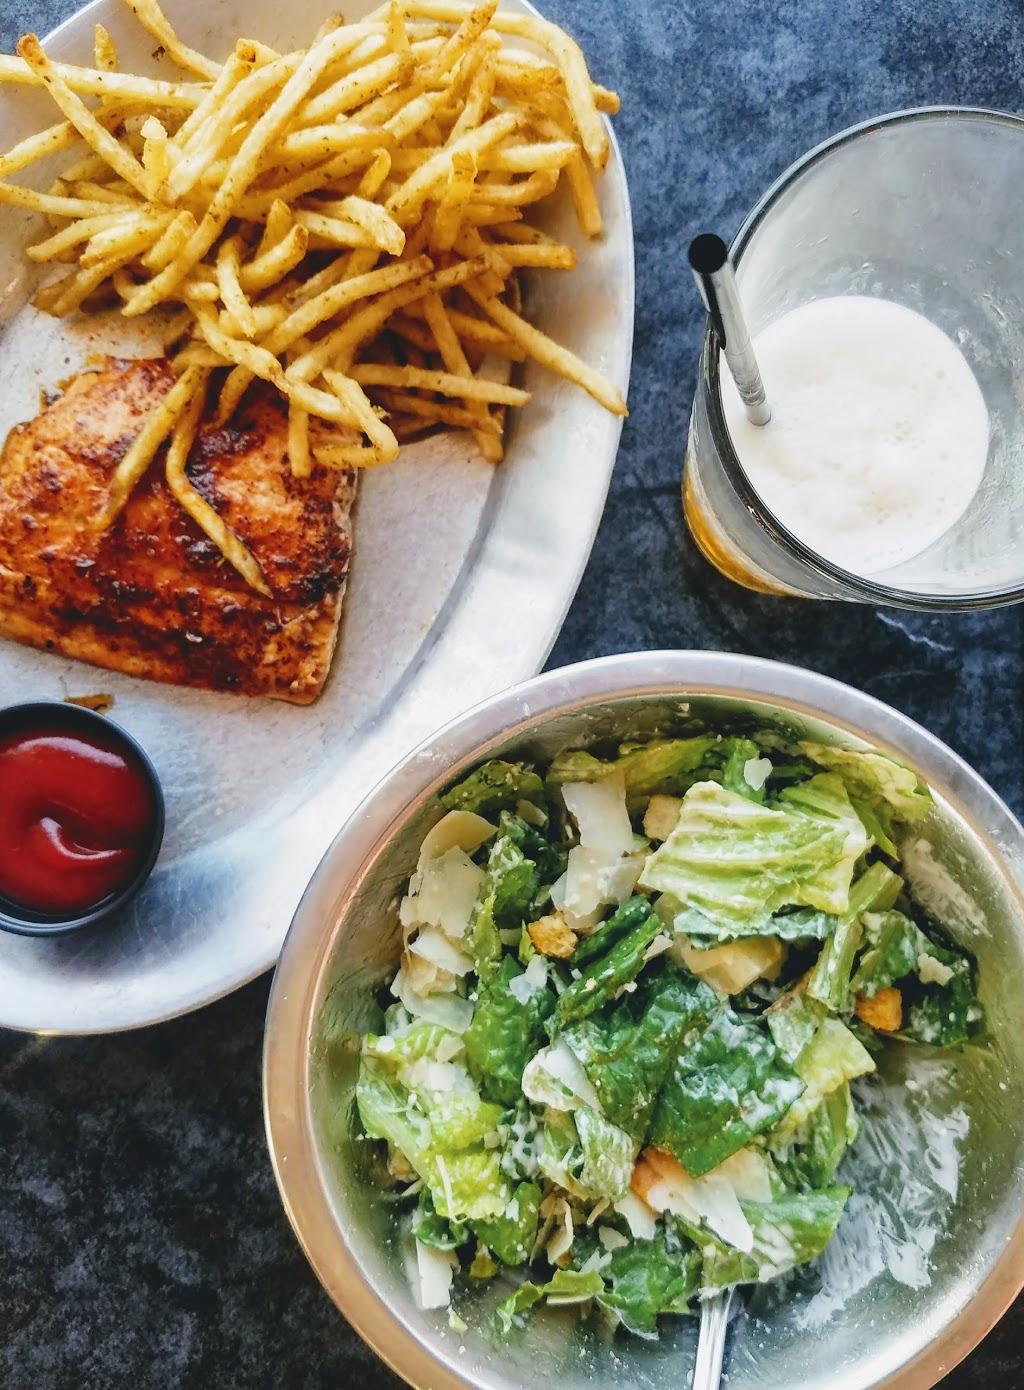 Shack 512 - restaurant  | Photo 10 of 10 | Address: 8714 Lime Creek Rd, Volente, TX 78641, USA | Phone: (512) 547-7610